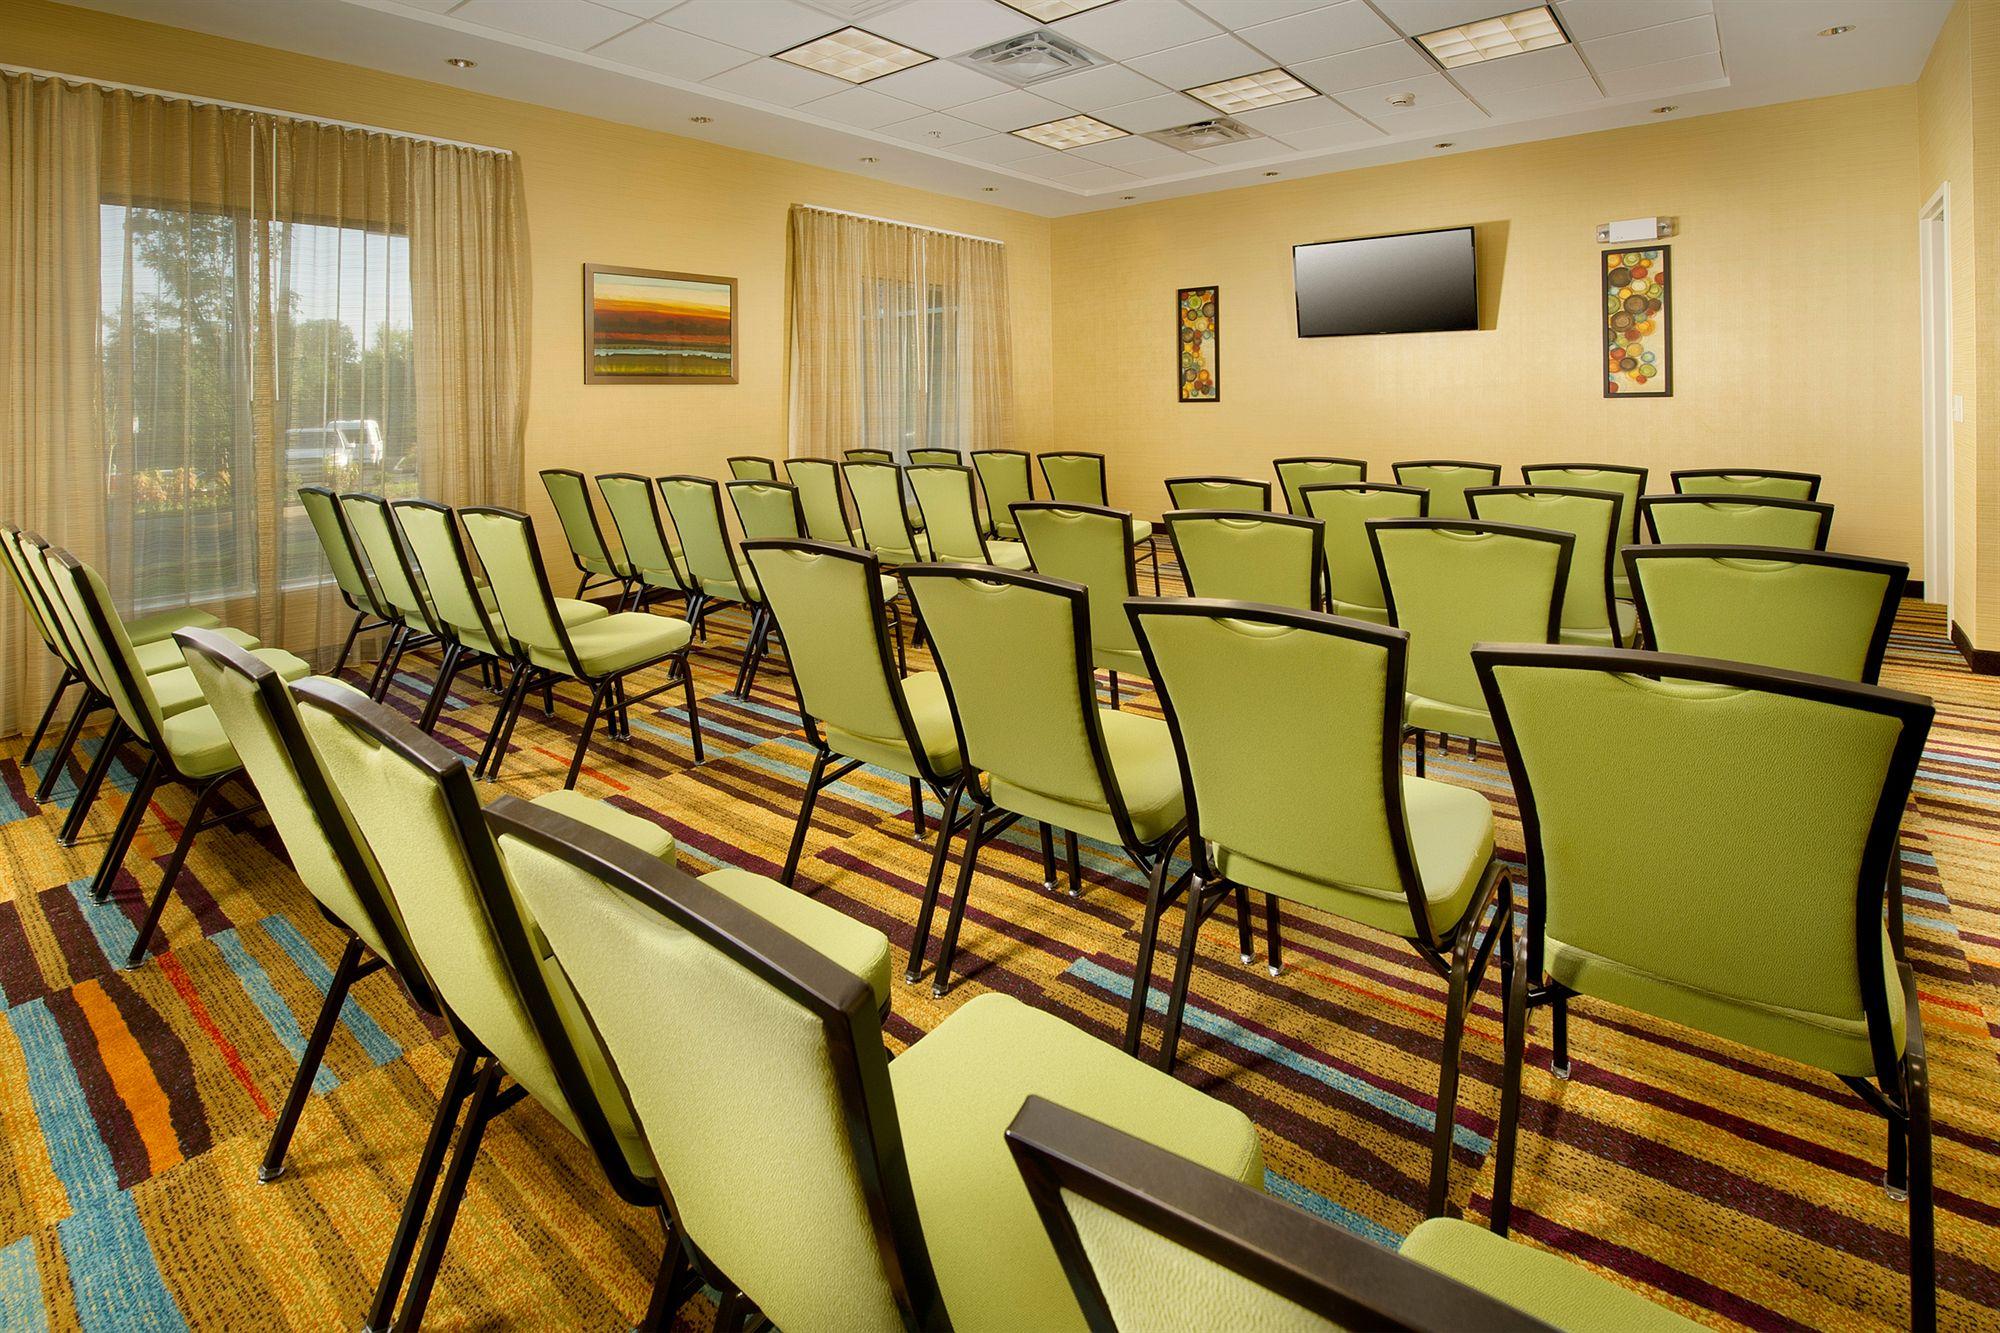 Fairfield Inn & Suites Knoxville West in Lenoir City, TN